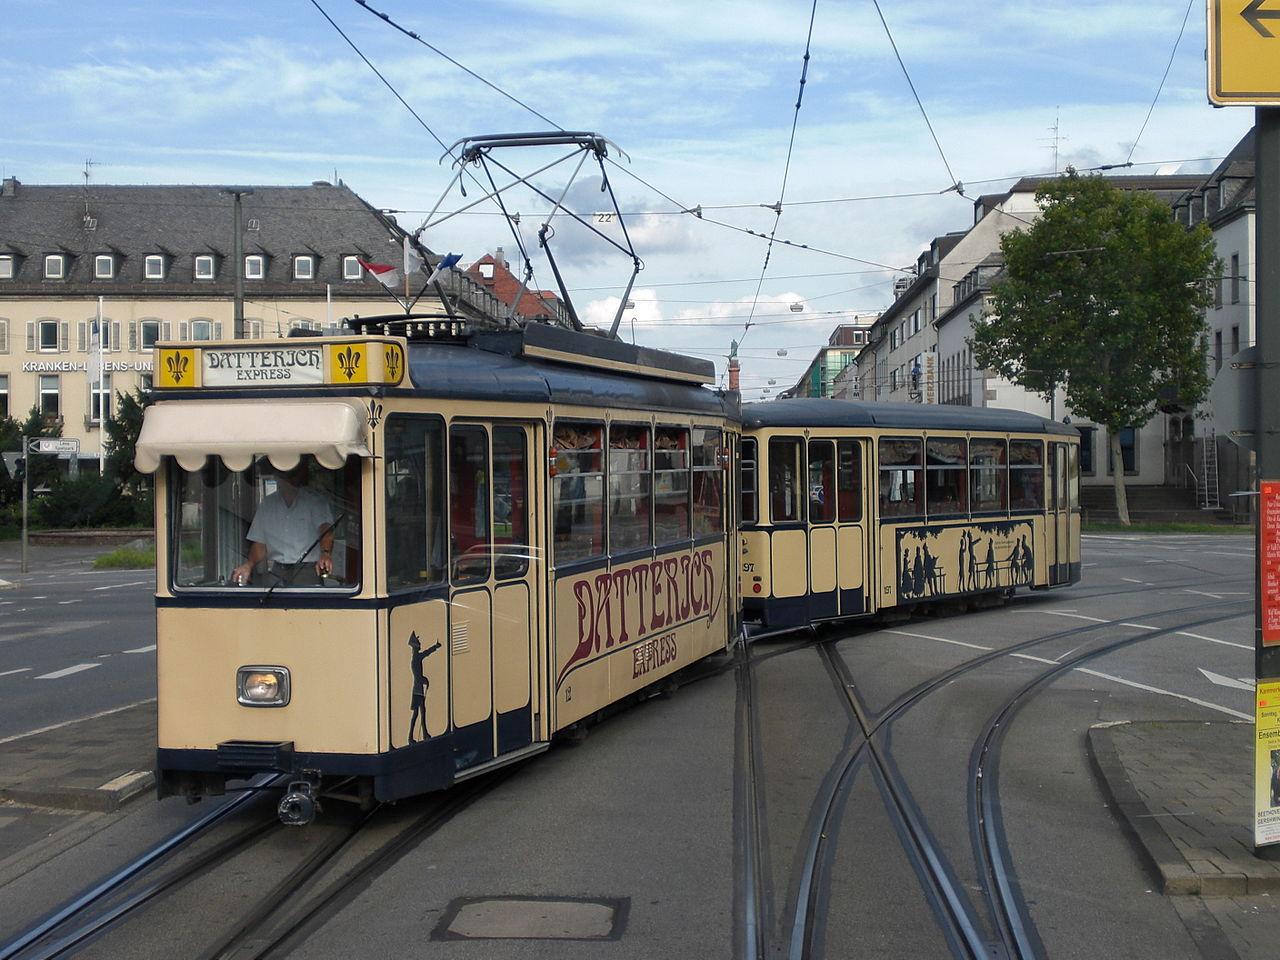 Bild Datterich Express Darmstadt